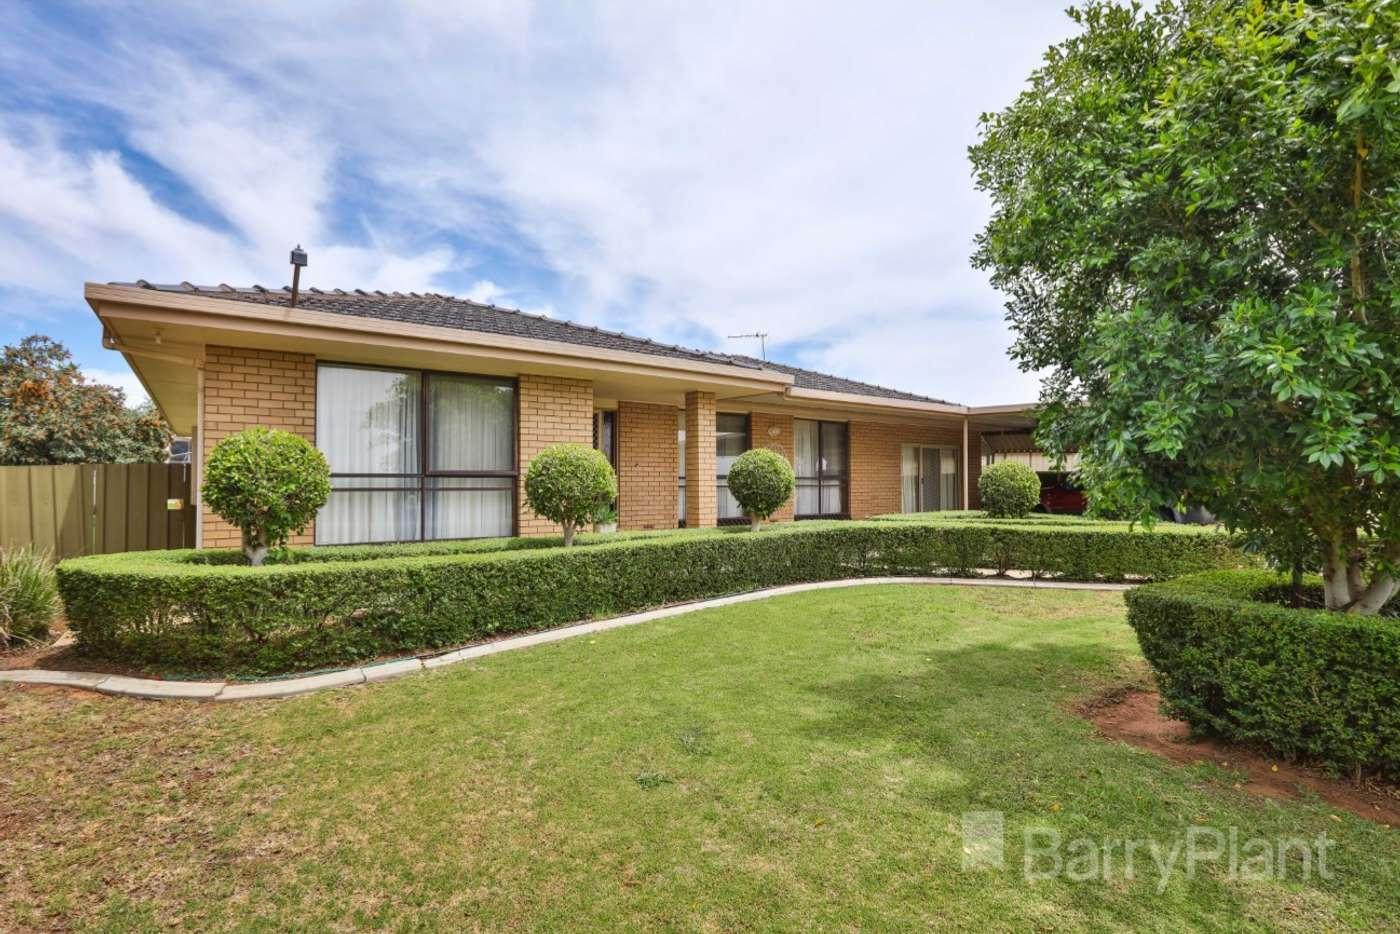 Main view of Homely house listing, 980-984 Fifteenth Street, Mildura VIC 3500